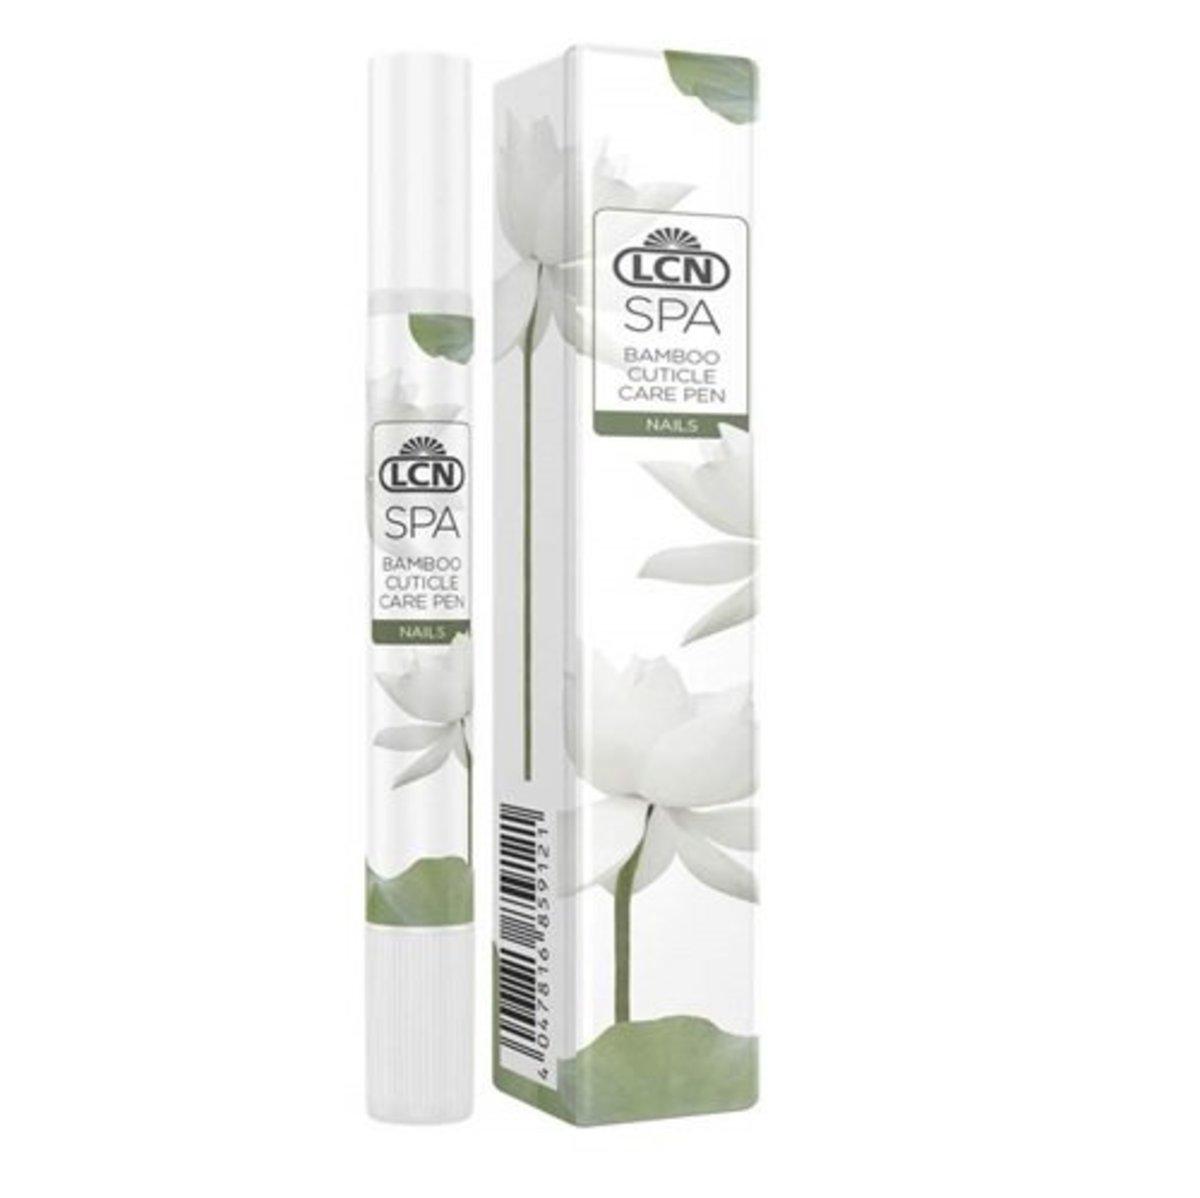 LCN SPA Bamboo Cuticle Care Pen 2.1g